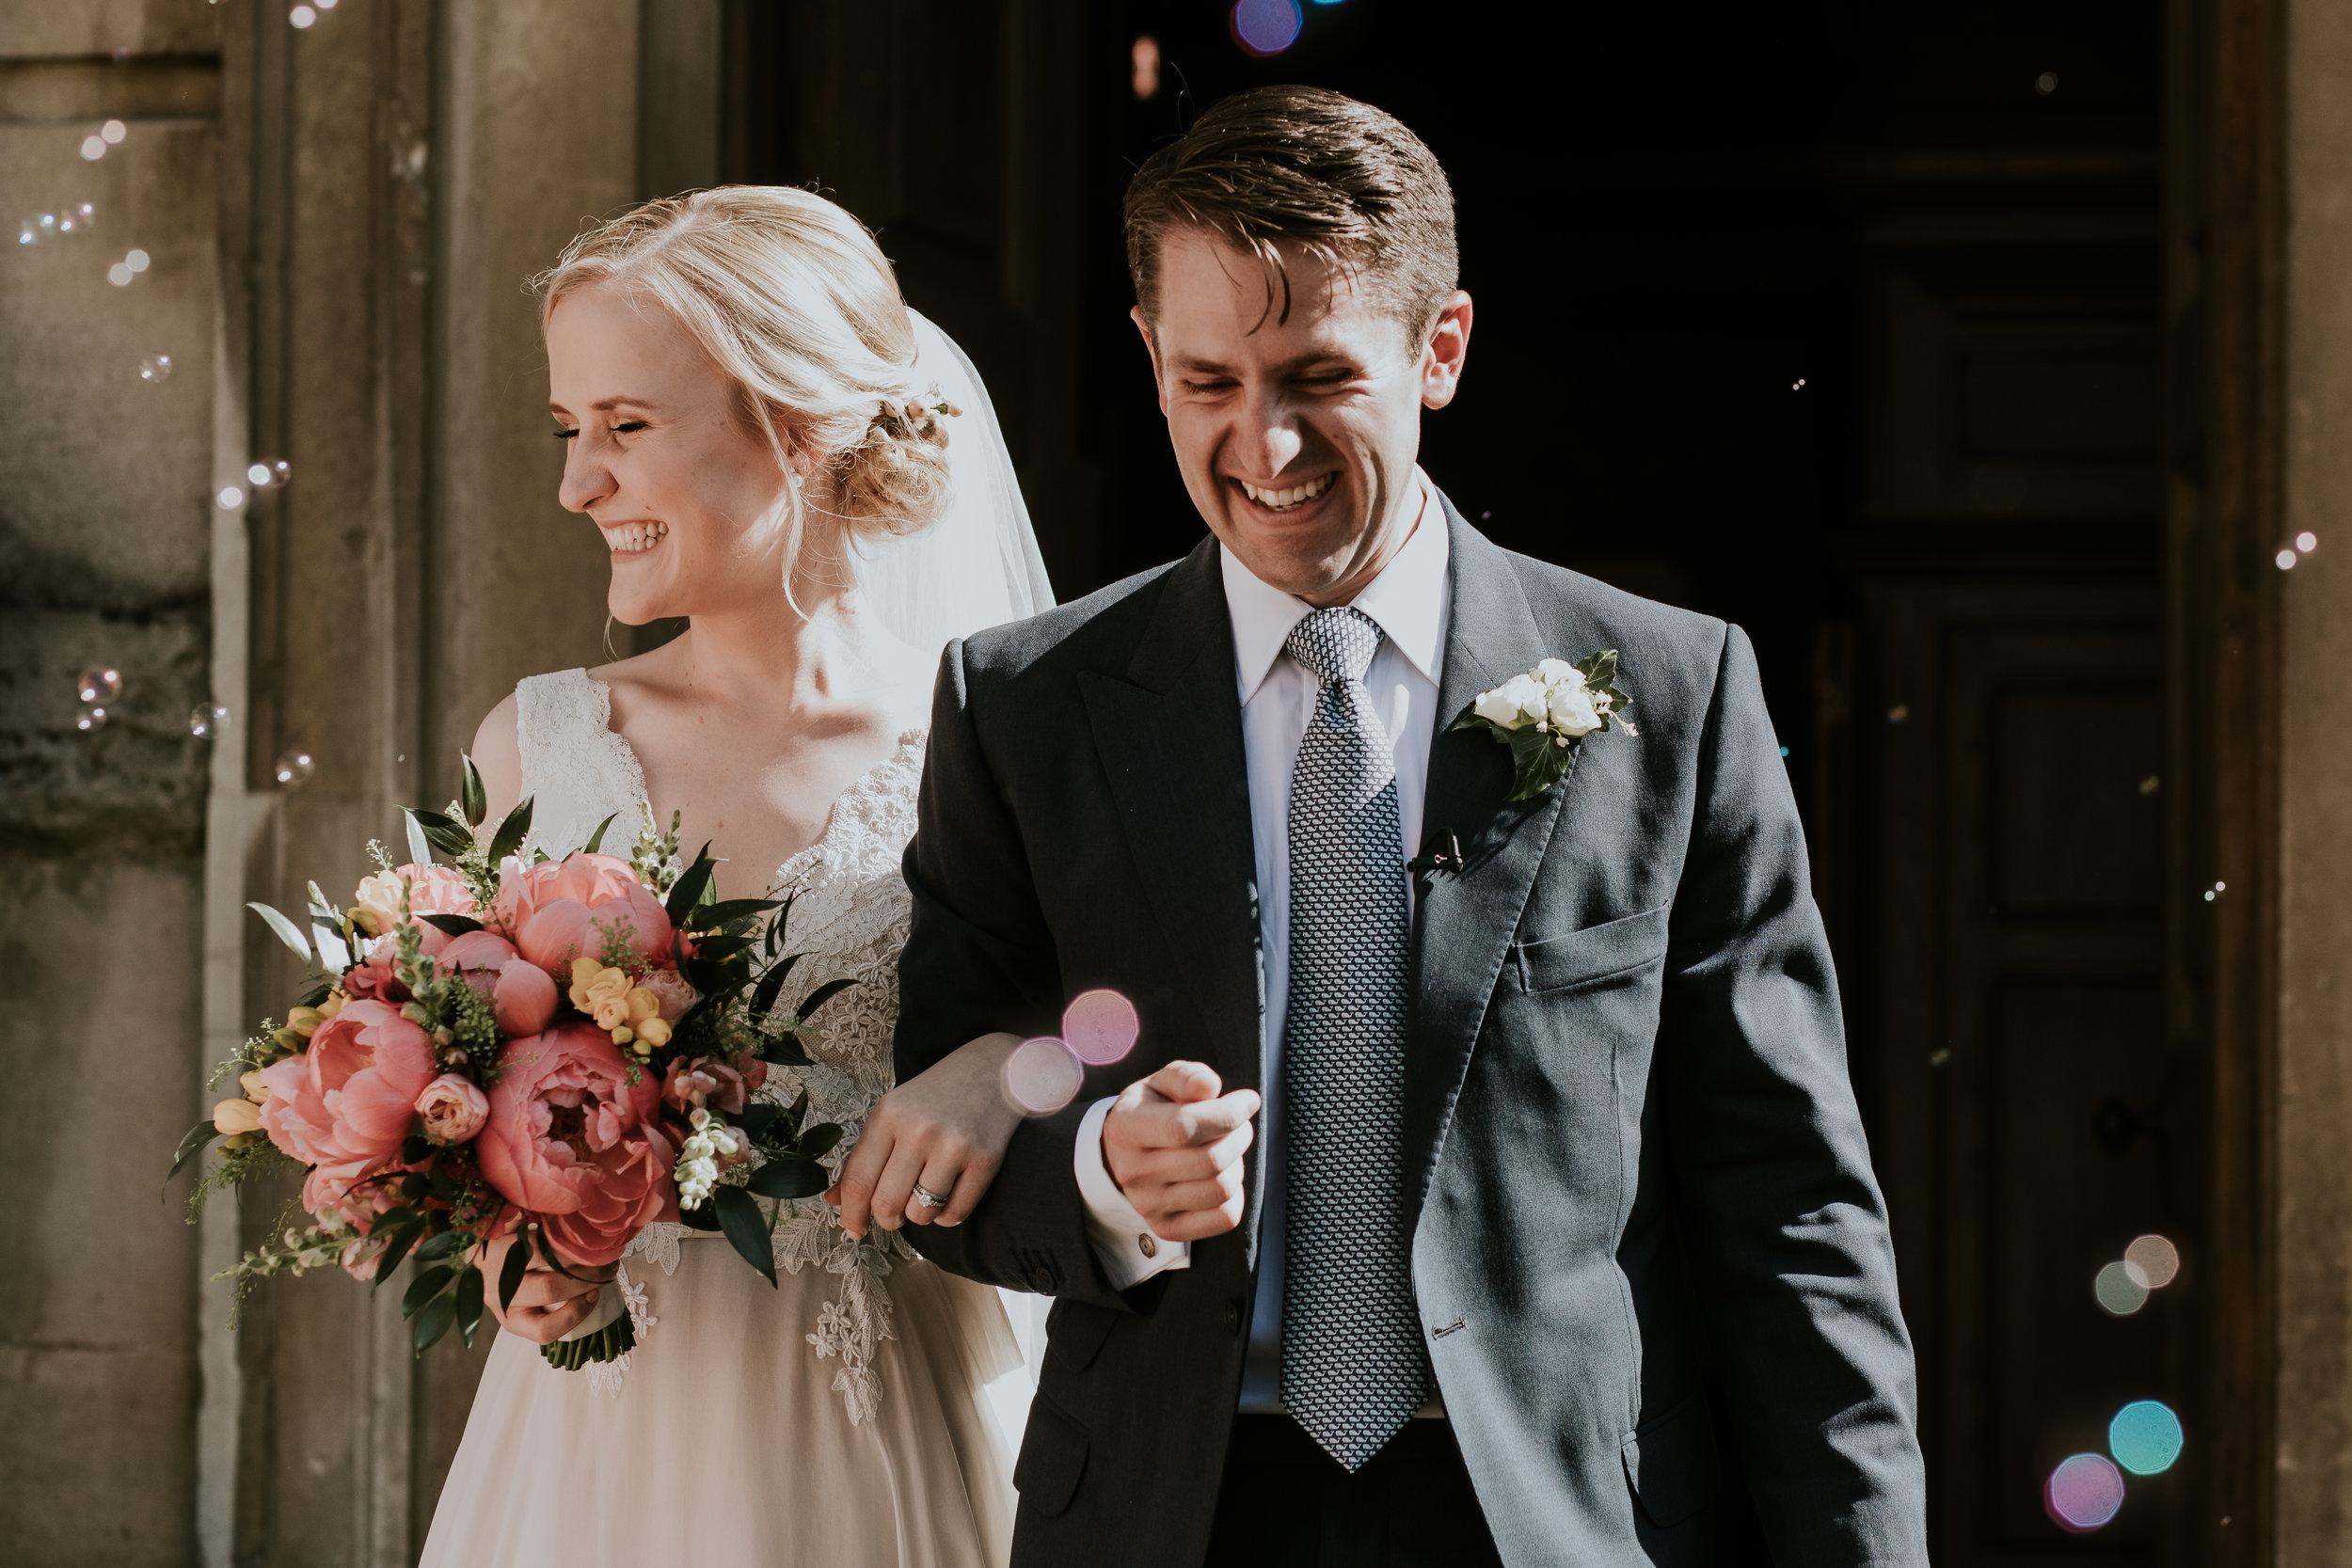 sam-andrew-wedding-pembroke-bodleian-kelechianna-72.jpg